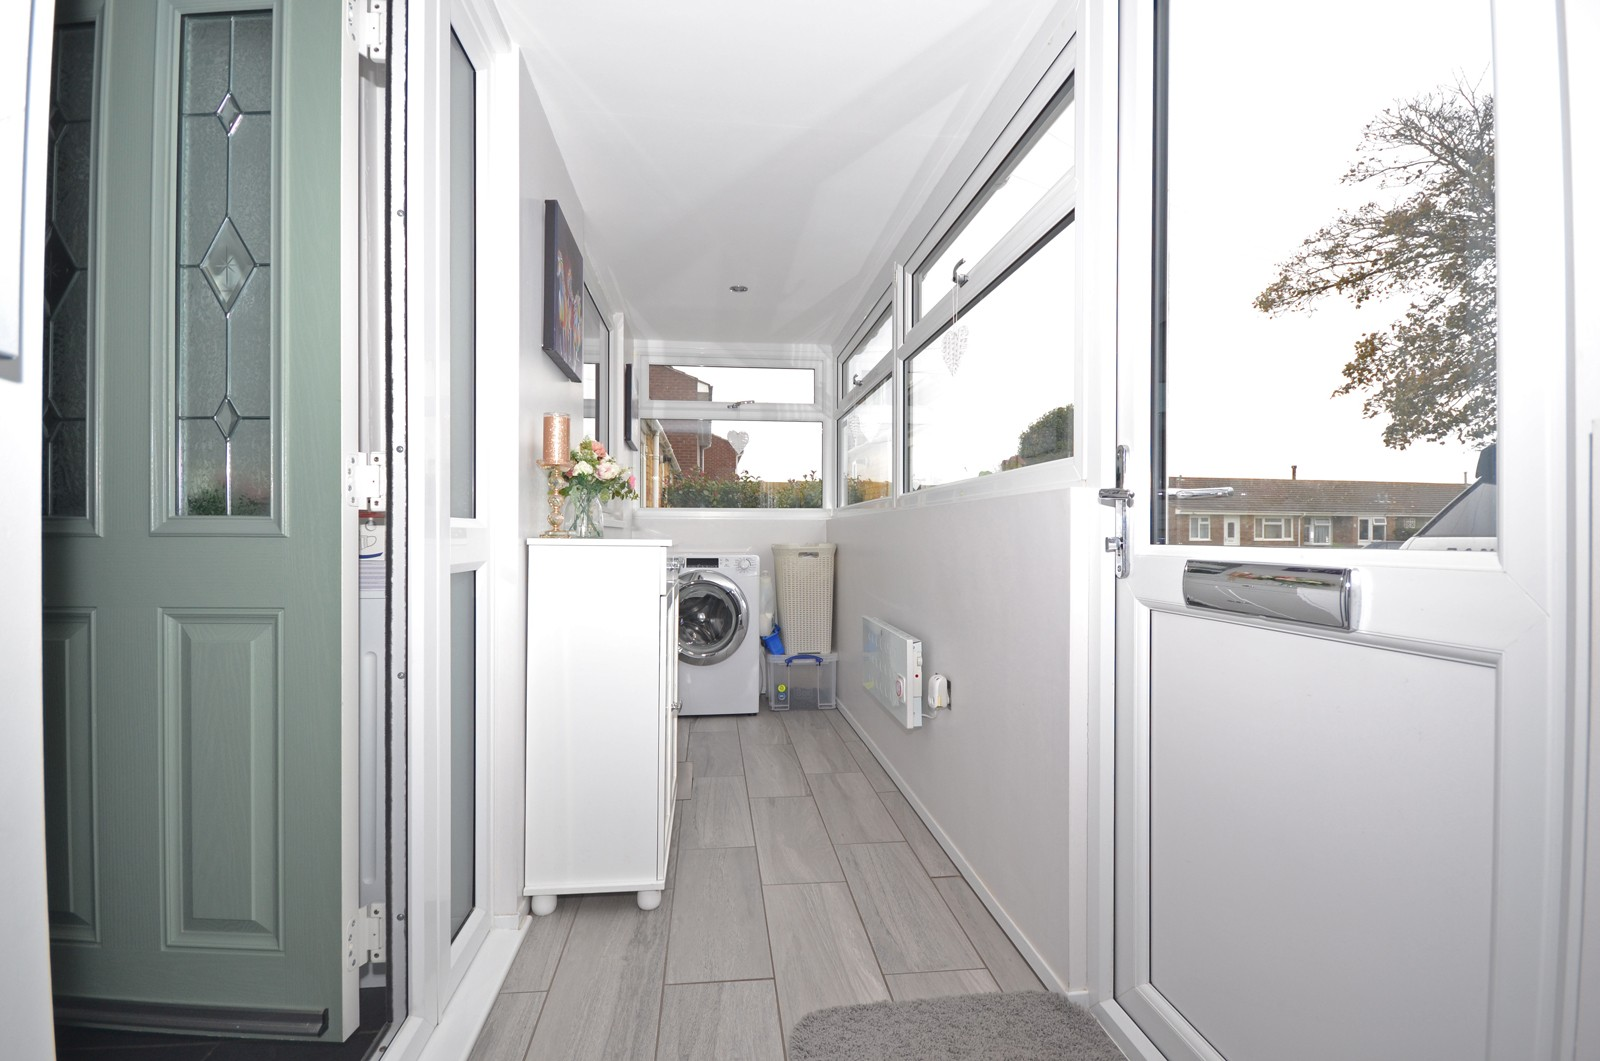 Entrance Porch/Utility Area